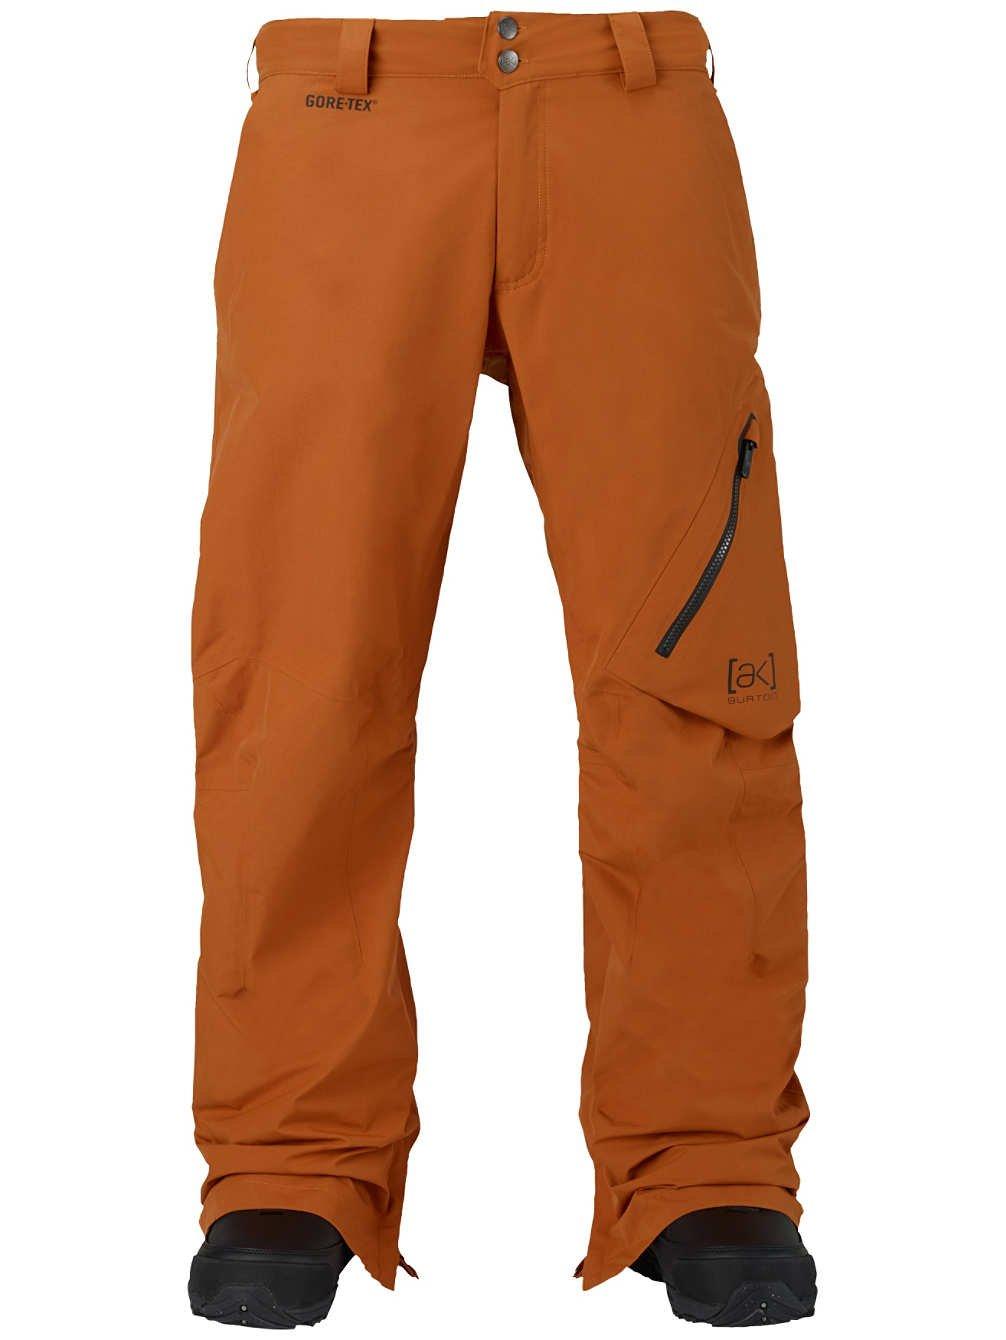 Burton Herren Snowboardhose AK 2L Cyclic Pants günstig bestellen